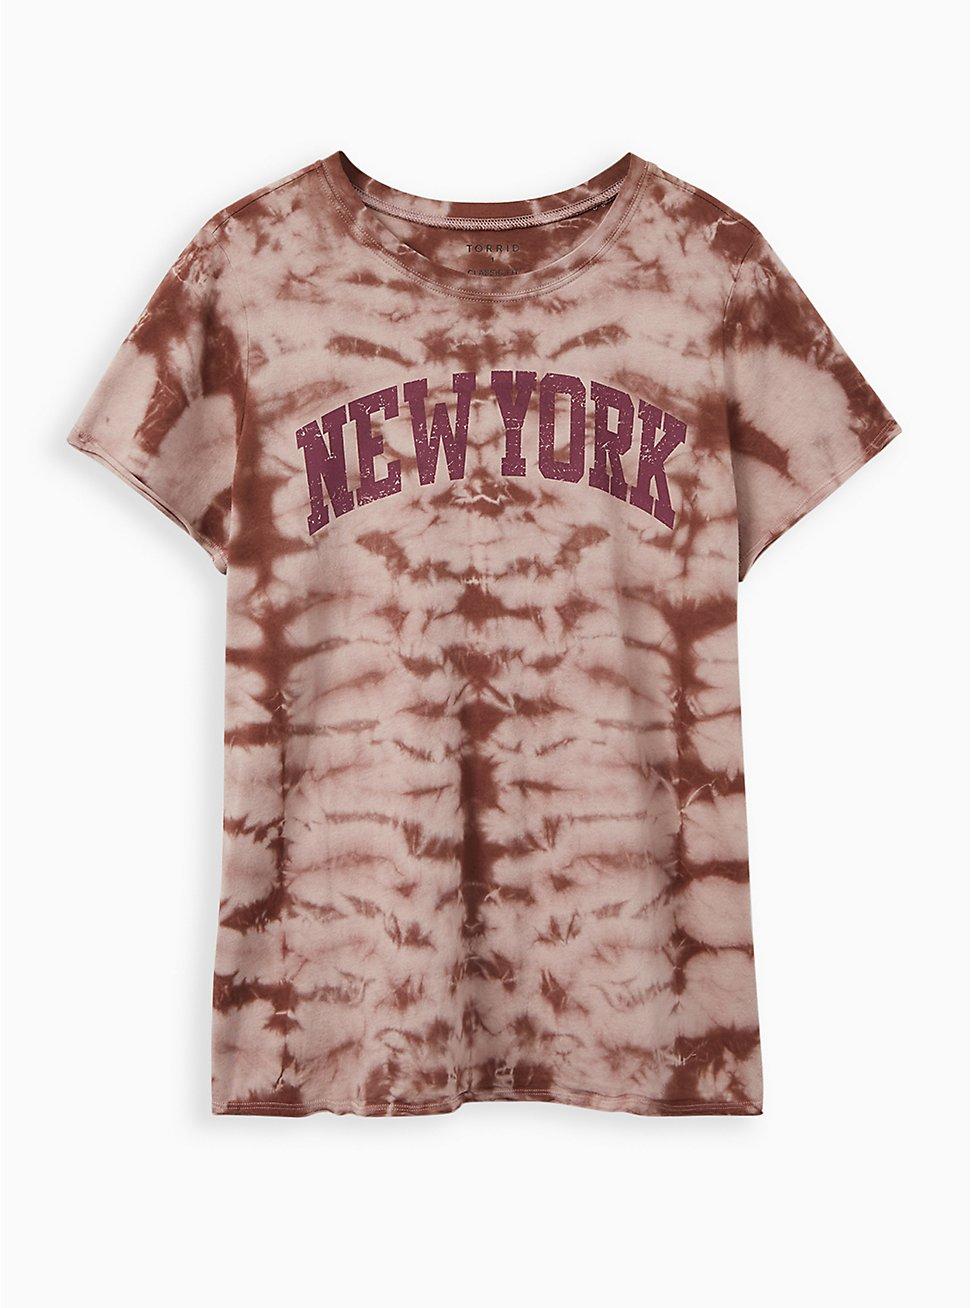 Classic Fit Crew Tee - New York Tie-Dye Burgundy Purple, PURPLE, hi-res